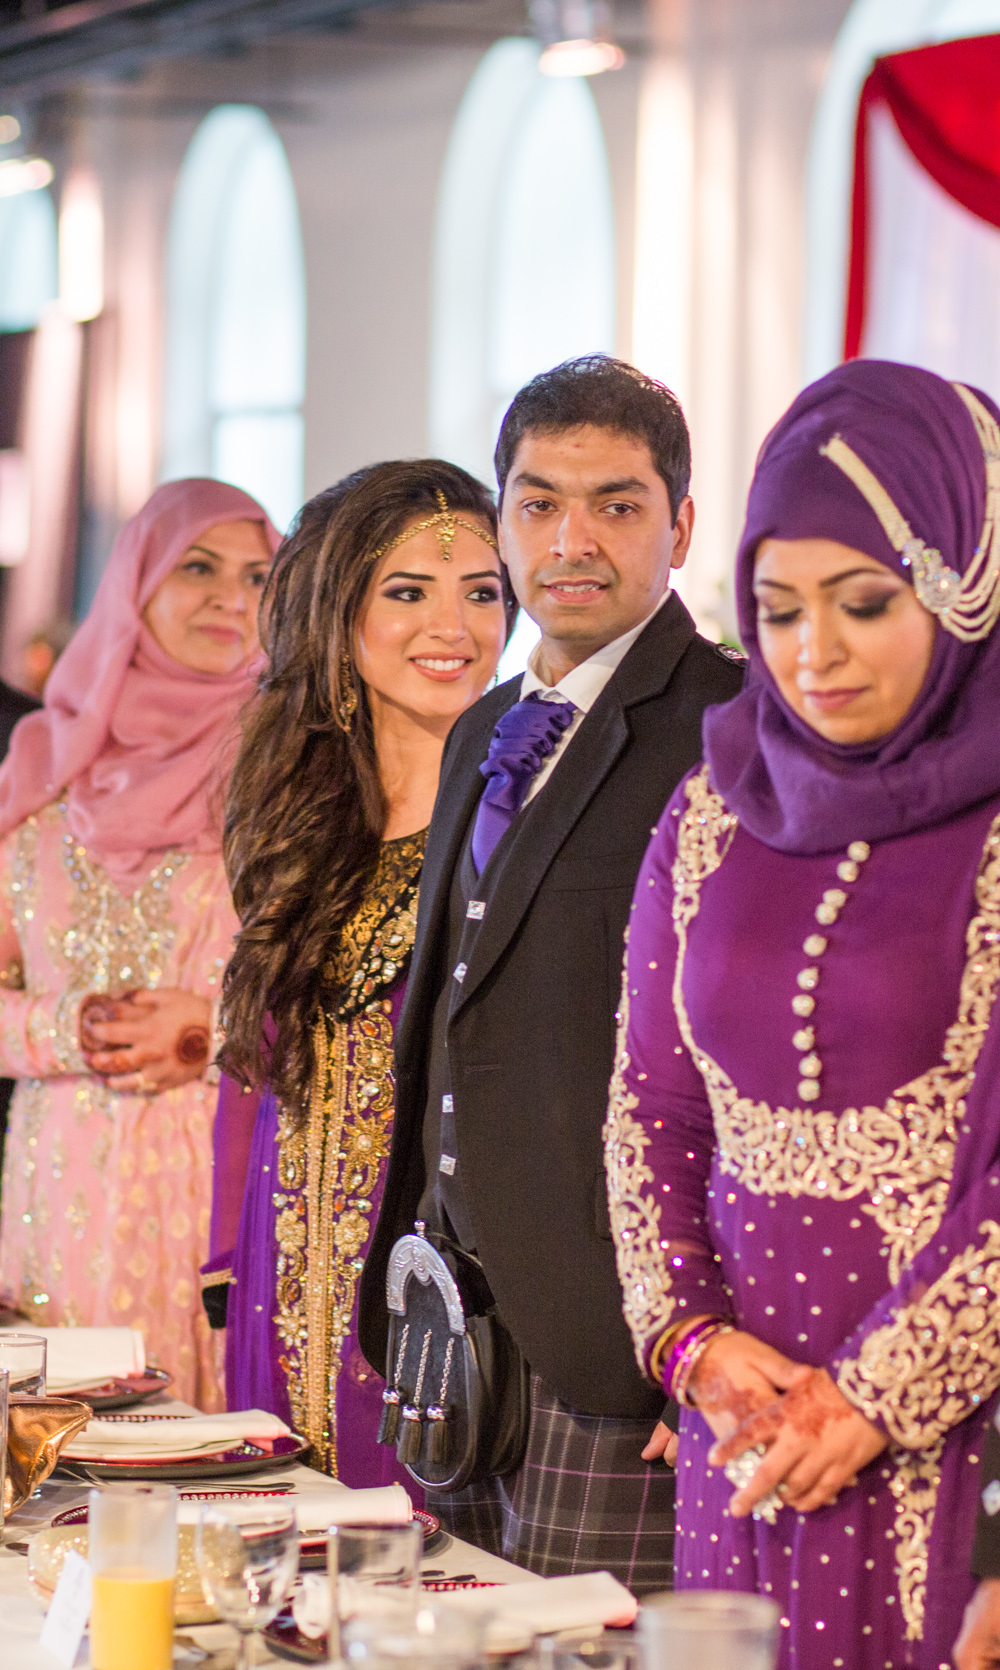 Asian Wedding Photographer Edinburgh Asian Wedding Photographer Glasgow Asian Wedding Photographer Manchester Scottish Wedding Pakistani Wedding Indian Wedding Hindu Wedding Opu Sultan Photographer Contemporary Asian Wedding Photographer-174.jpg